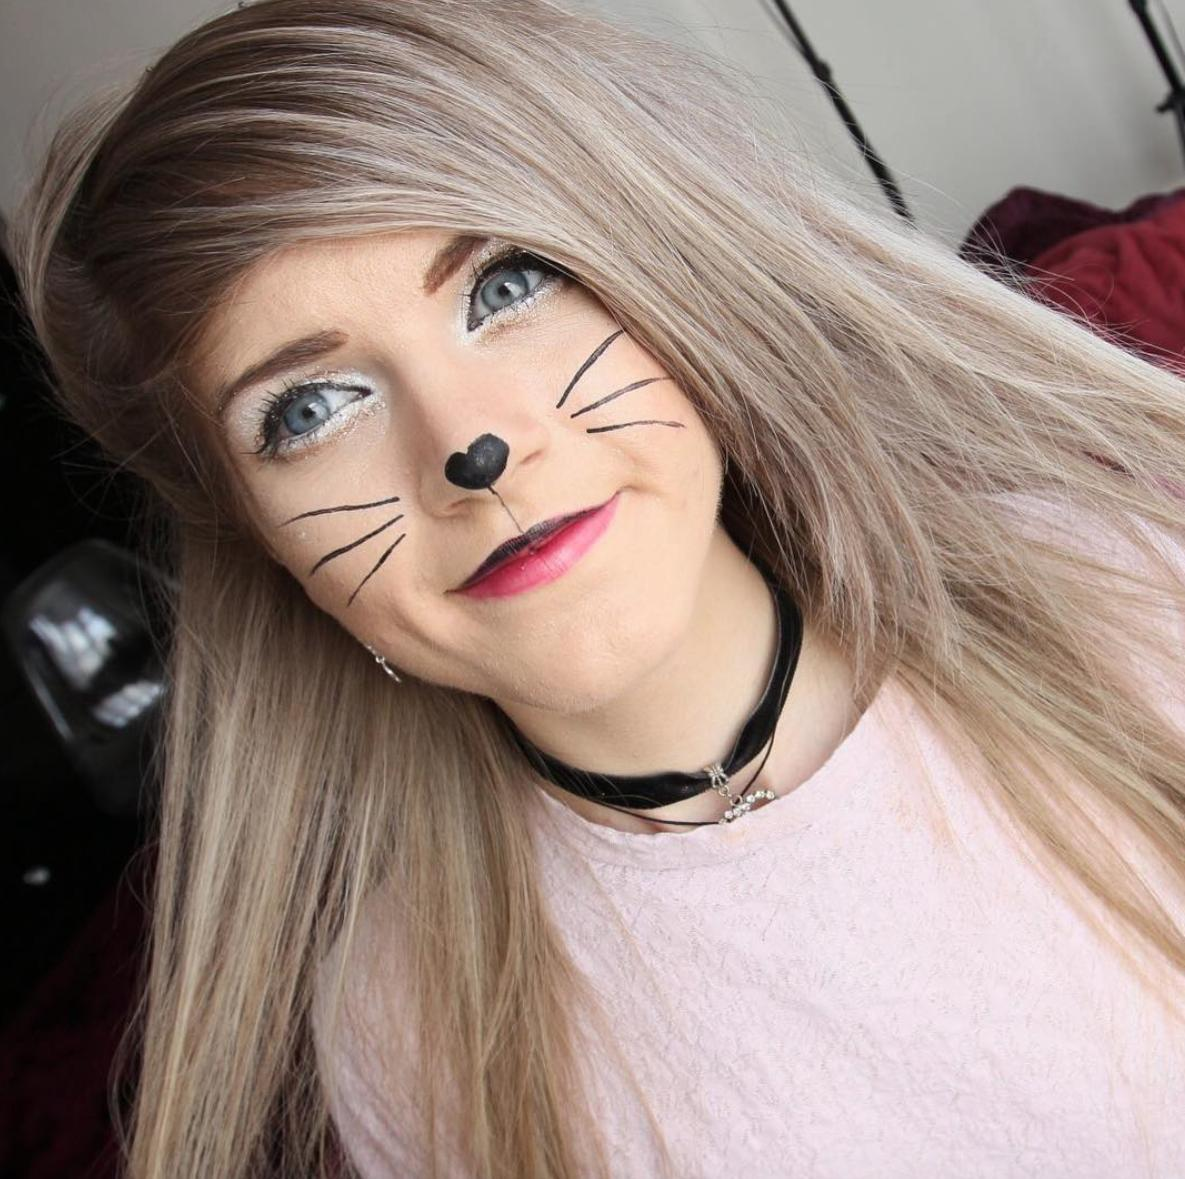 Marina Joyce YouTuber